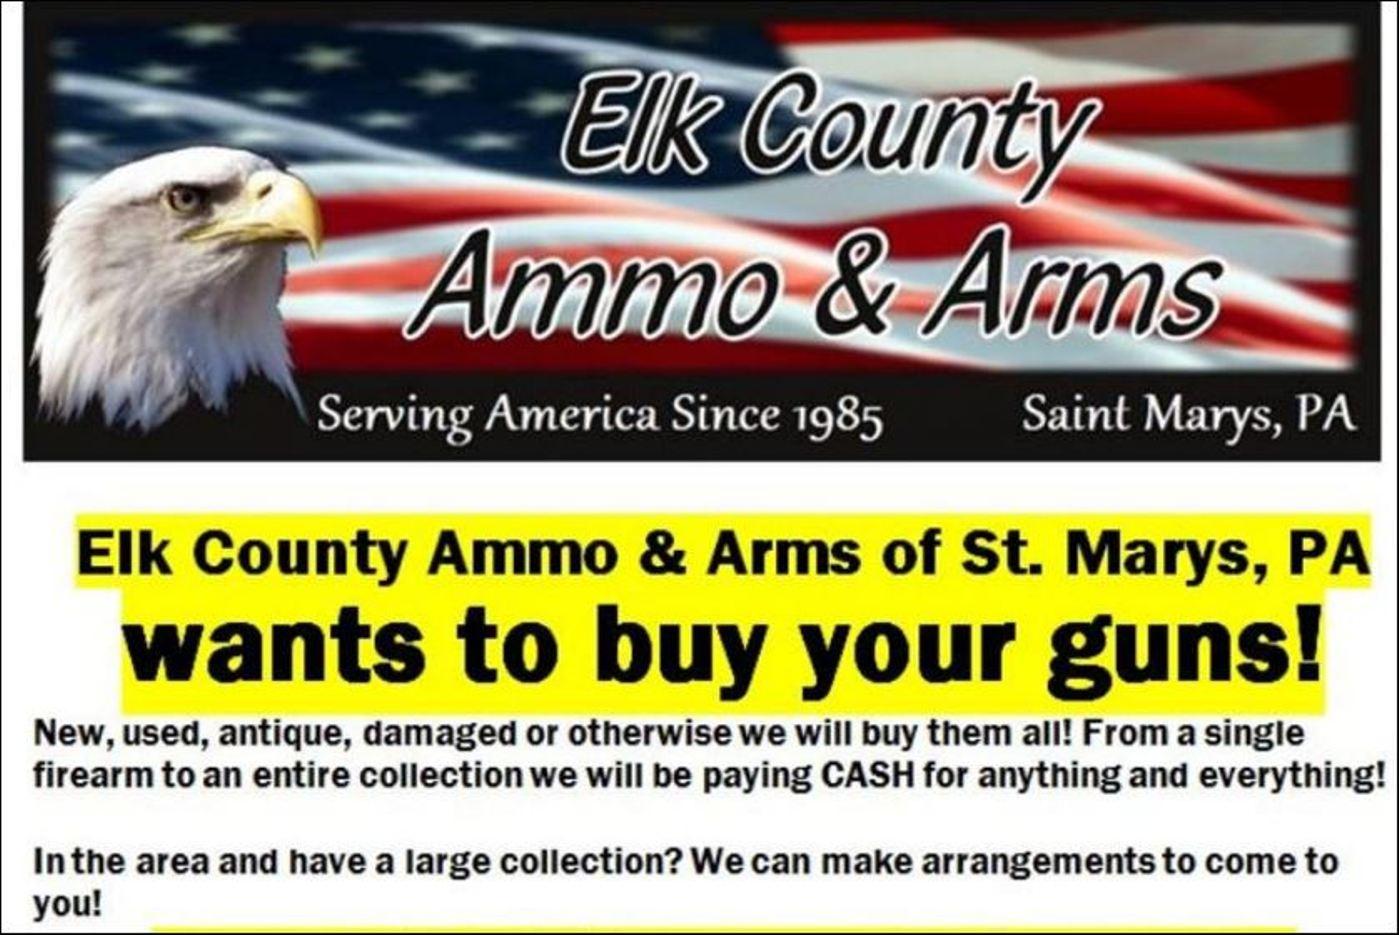 Elk Ammo & Arms, St. Marys, PA